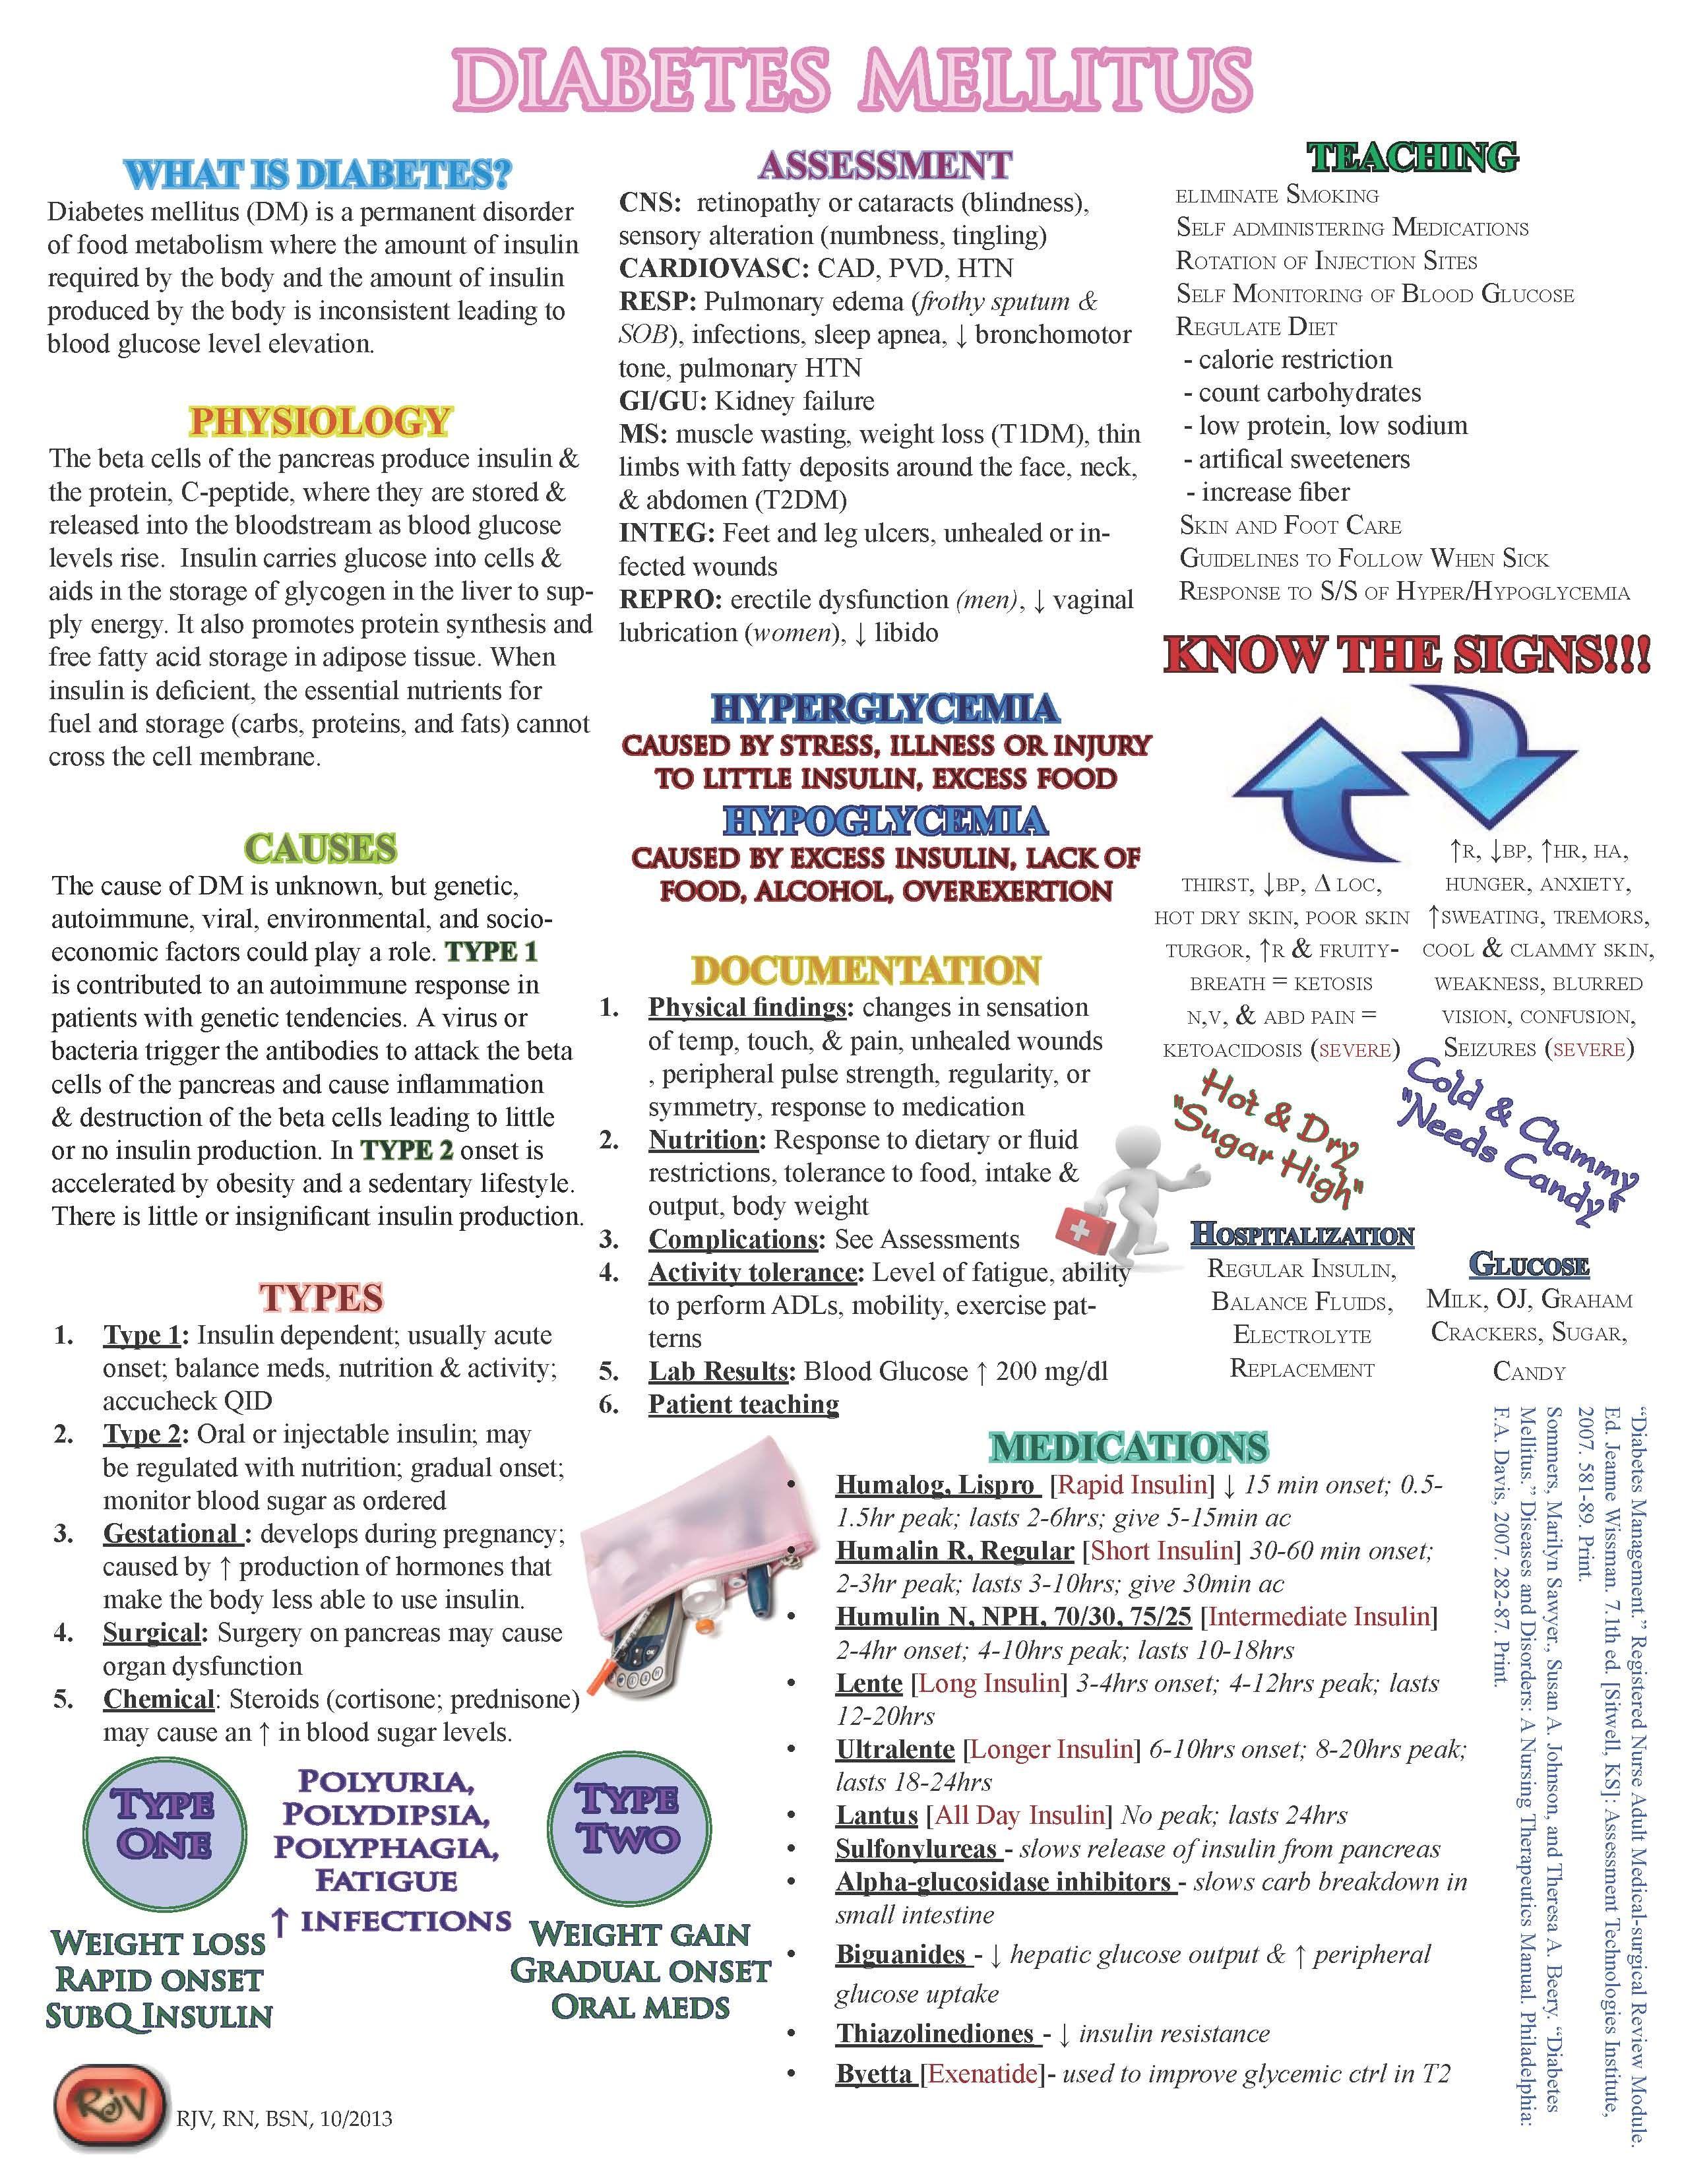 Diabetes Mellitus Cheat Sheet